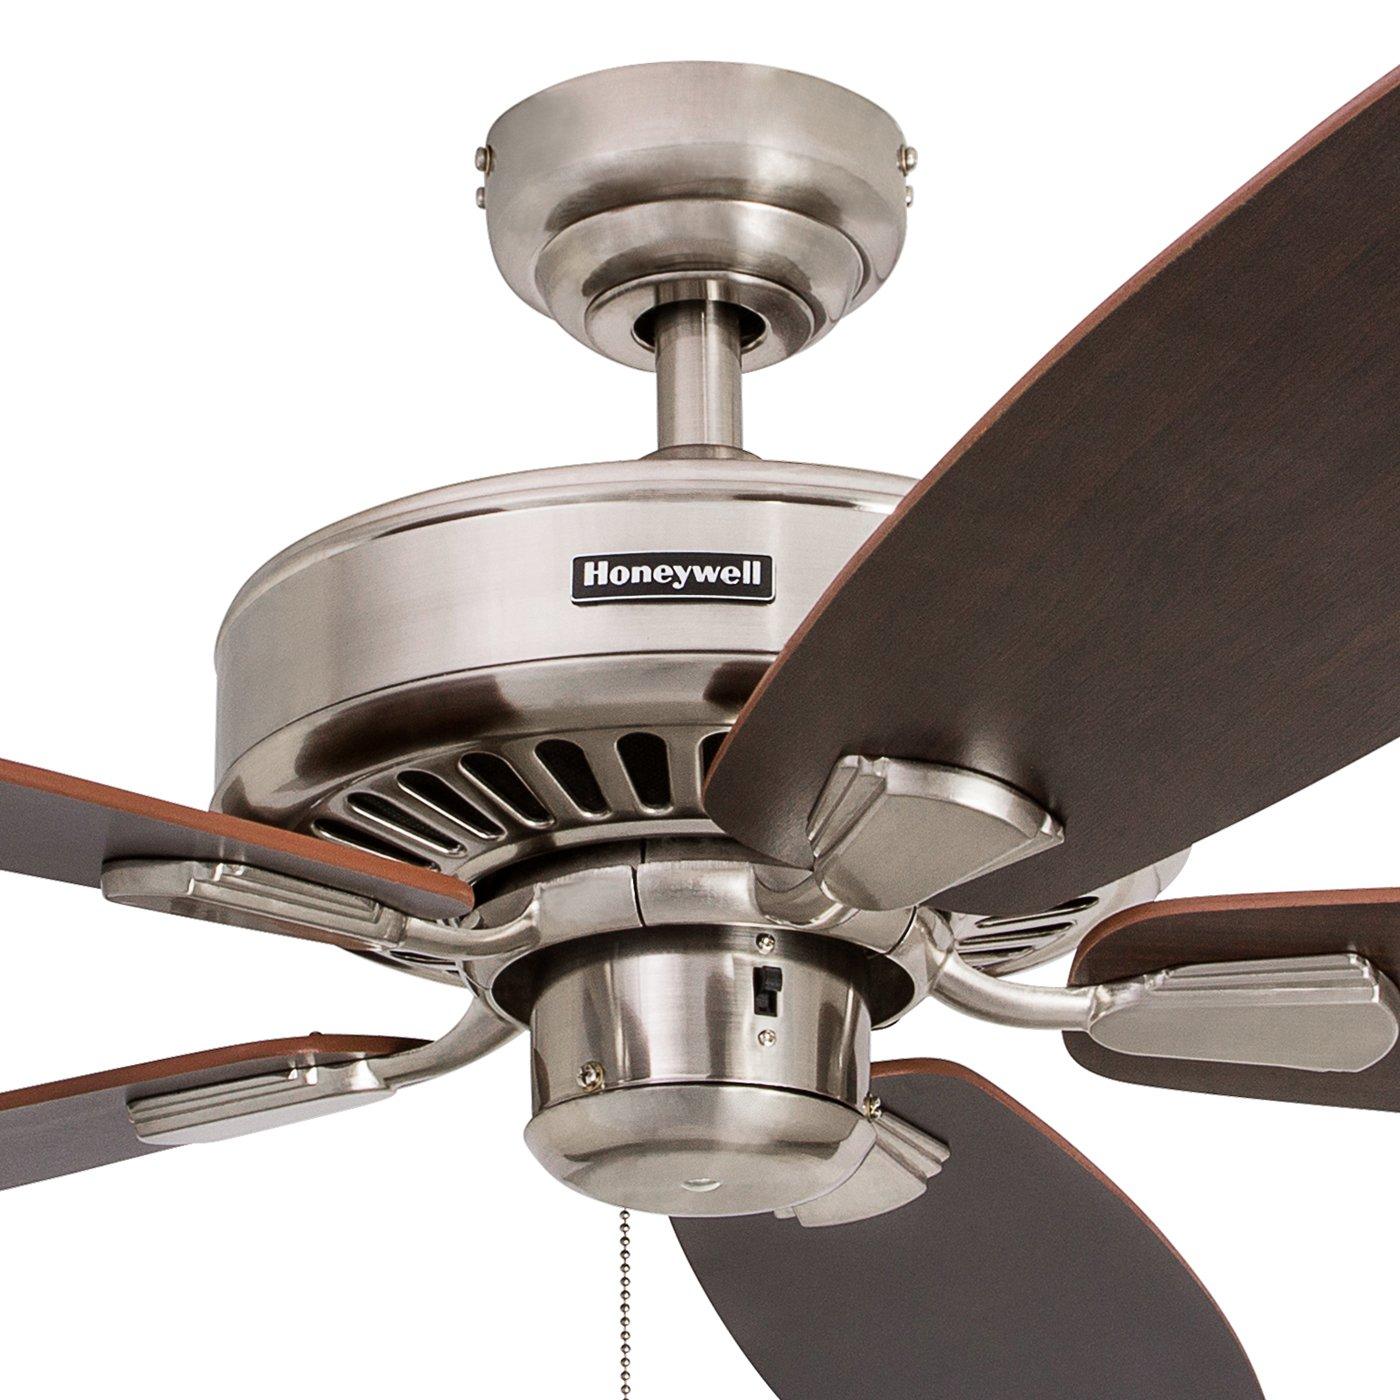 Honeywell Sutton 52-Inch Ceiling Fan, Energy Star Certified, Five Reversible Burnt Maple Light Oak Blades, Brushed Nickel